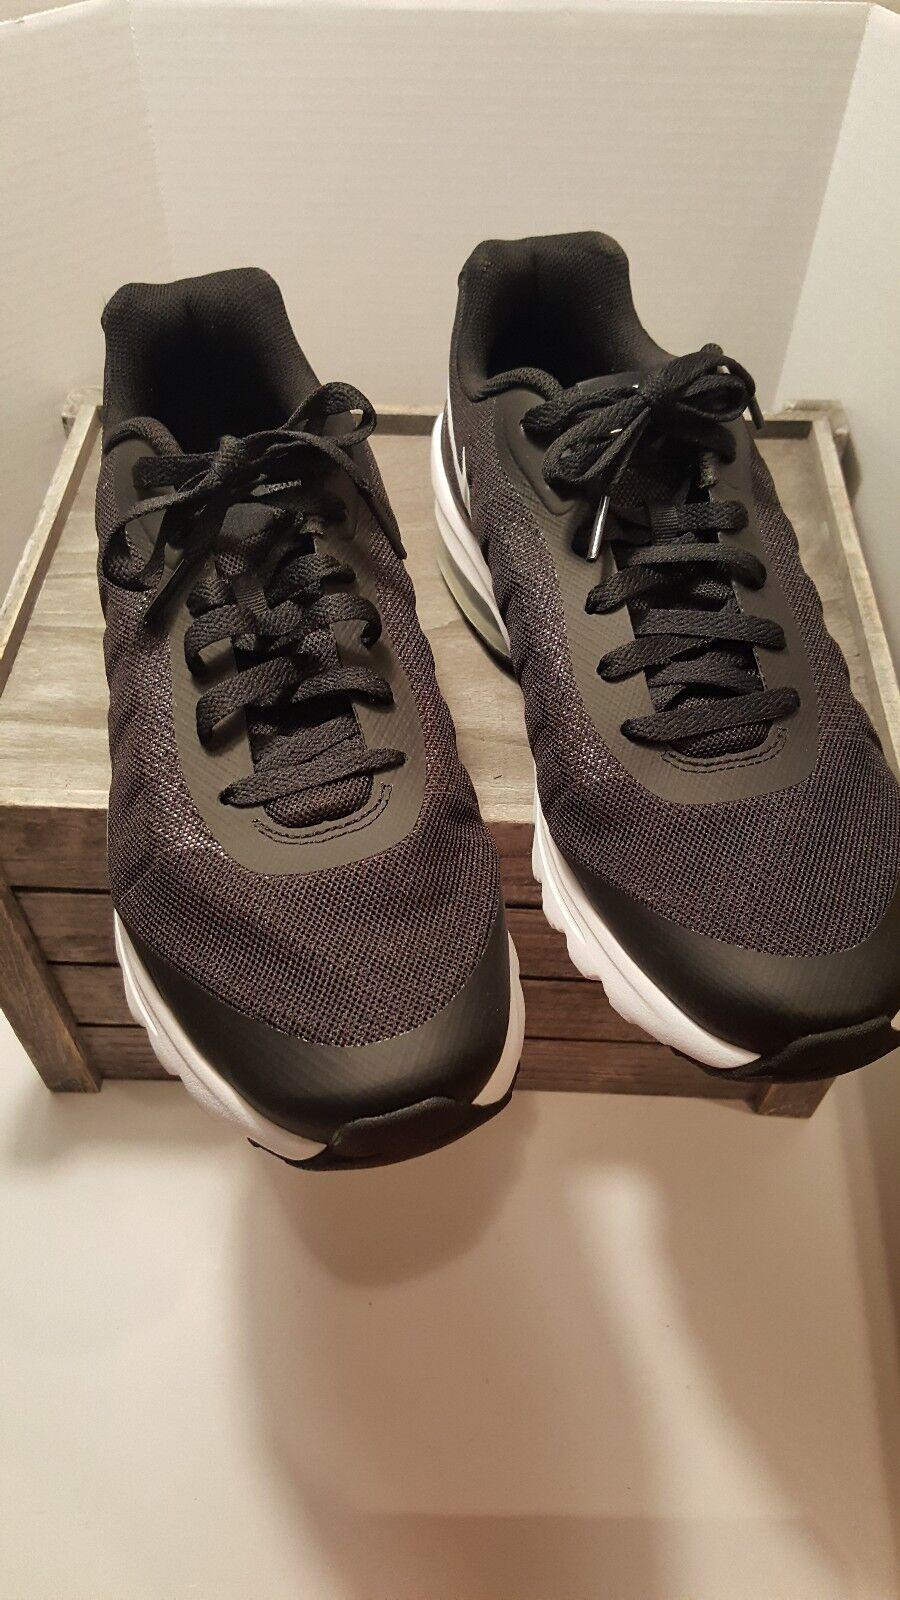 d746dbb0e88 NEW NEW NEW NIKE Air Max Invigor BLACK Mens sz 11 NEW 749680-010 Runner  Running Shoes 3d438e